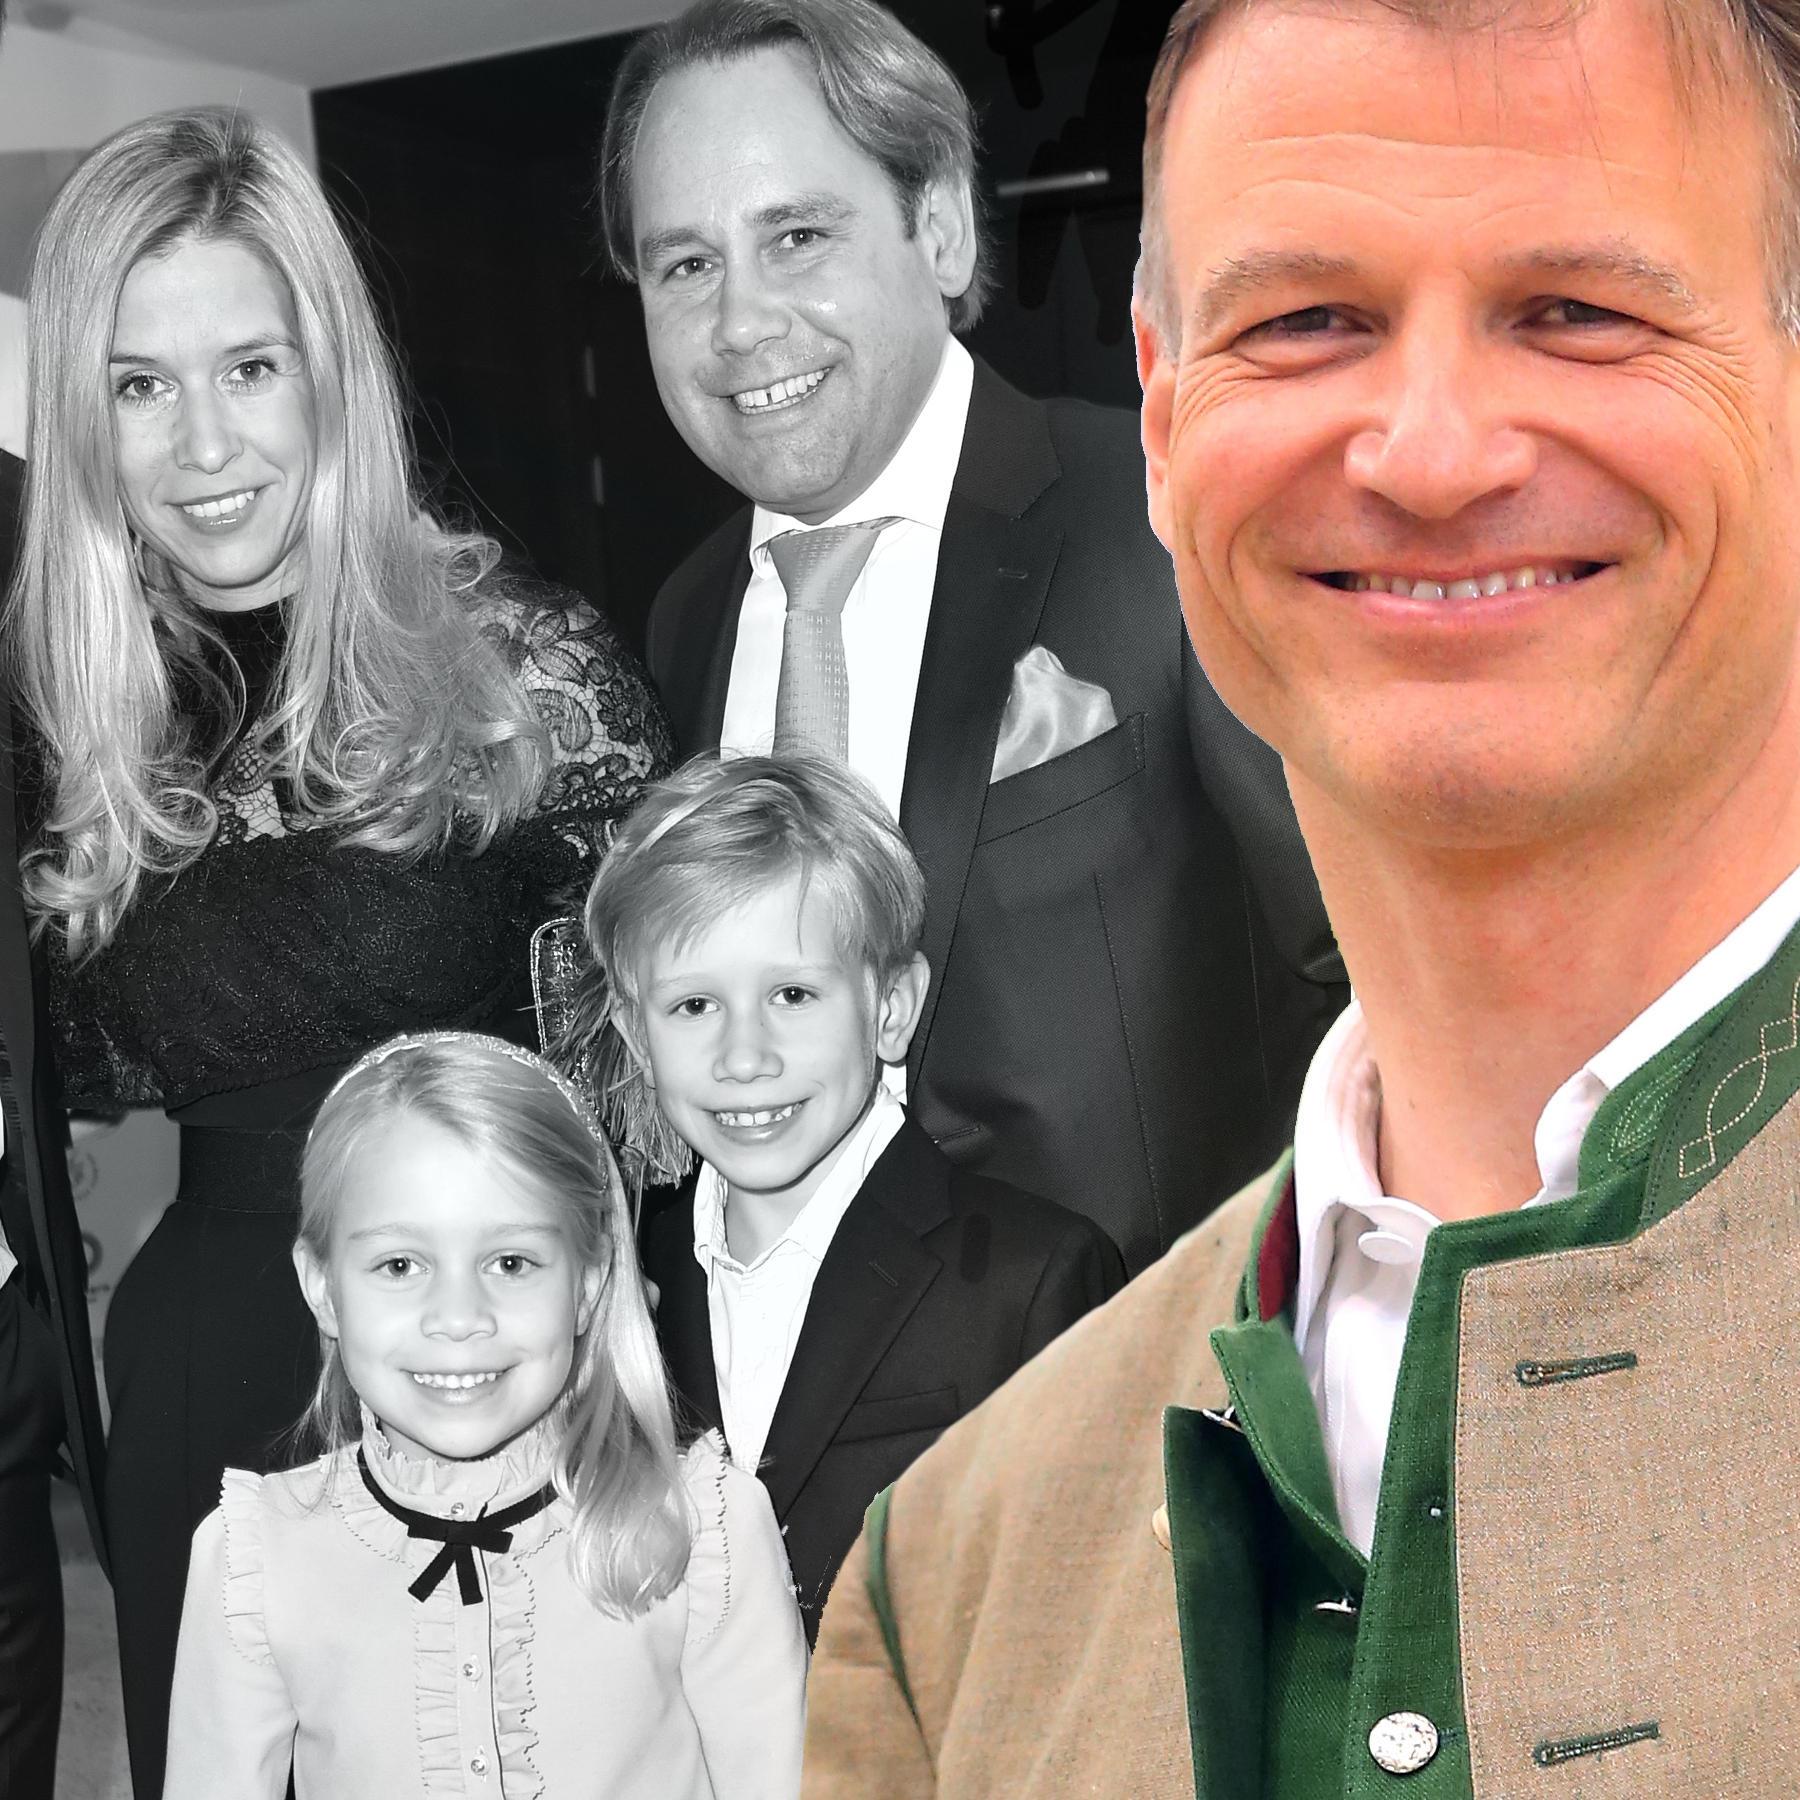 Familie Inselkammer: Christina Inselkammer,August Inselkammer jr., die Kinder Max und Sophie Inselkammer und Yannik Inselkammer